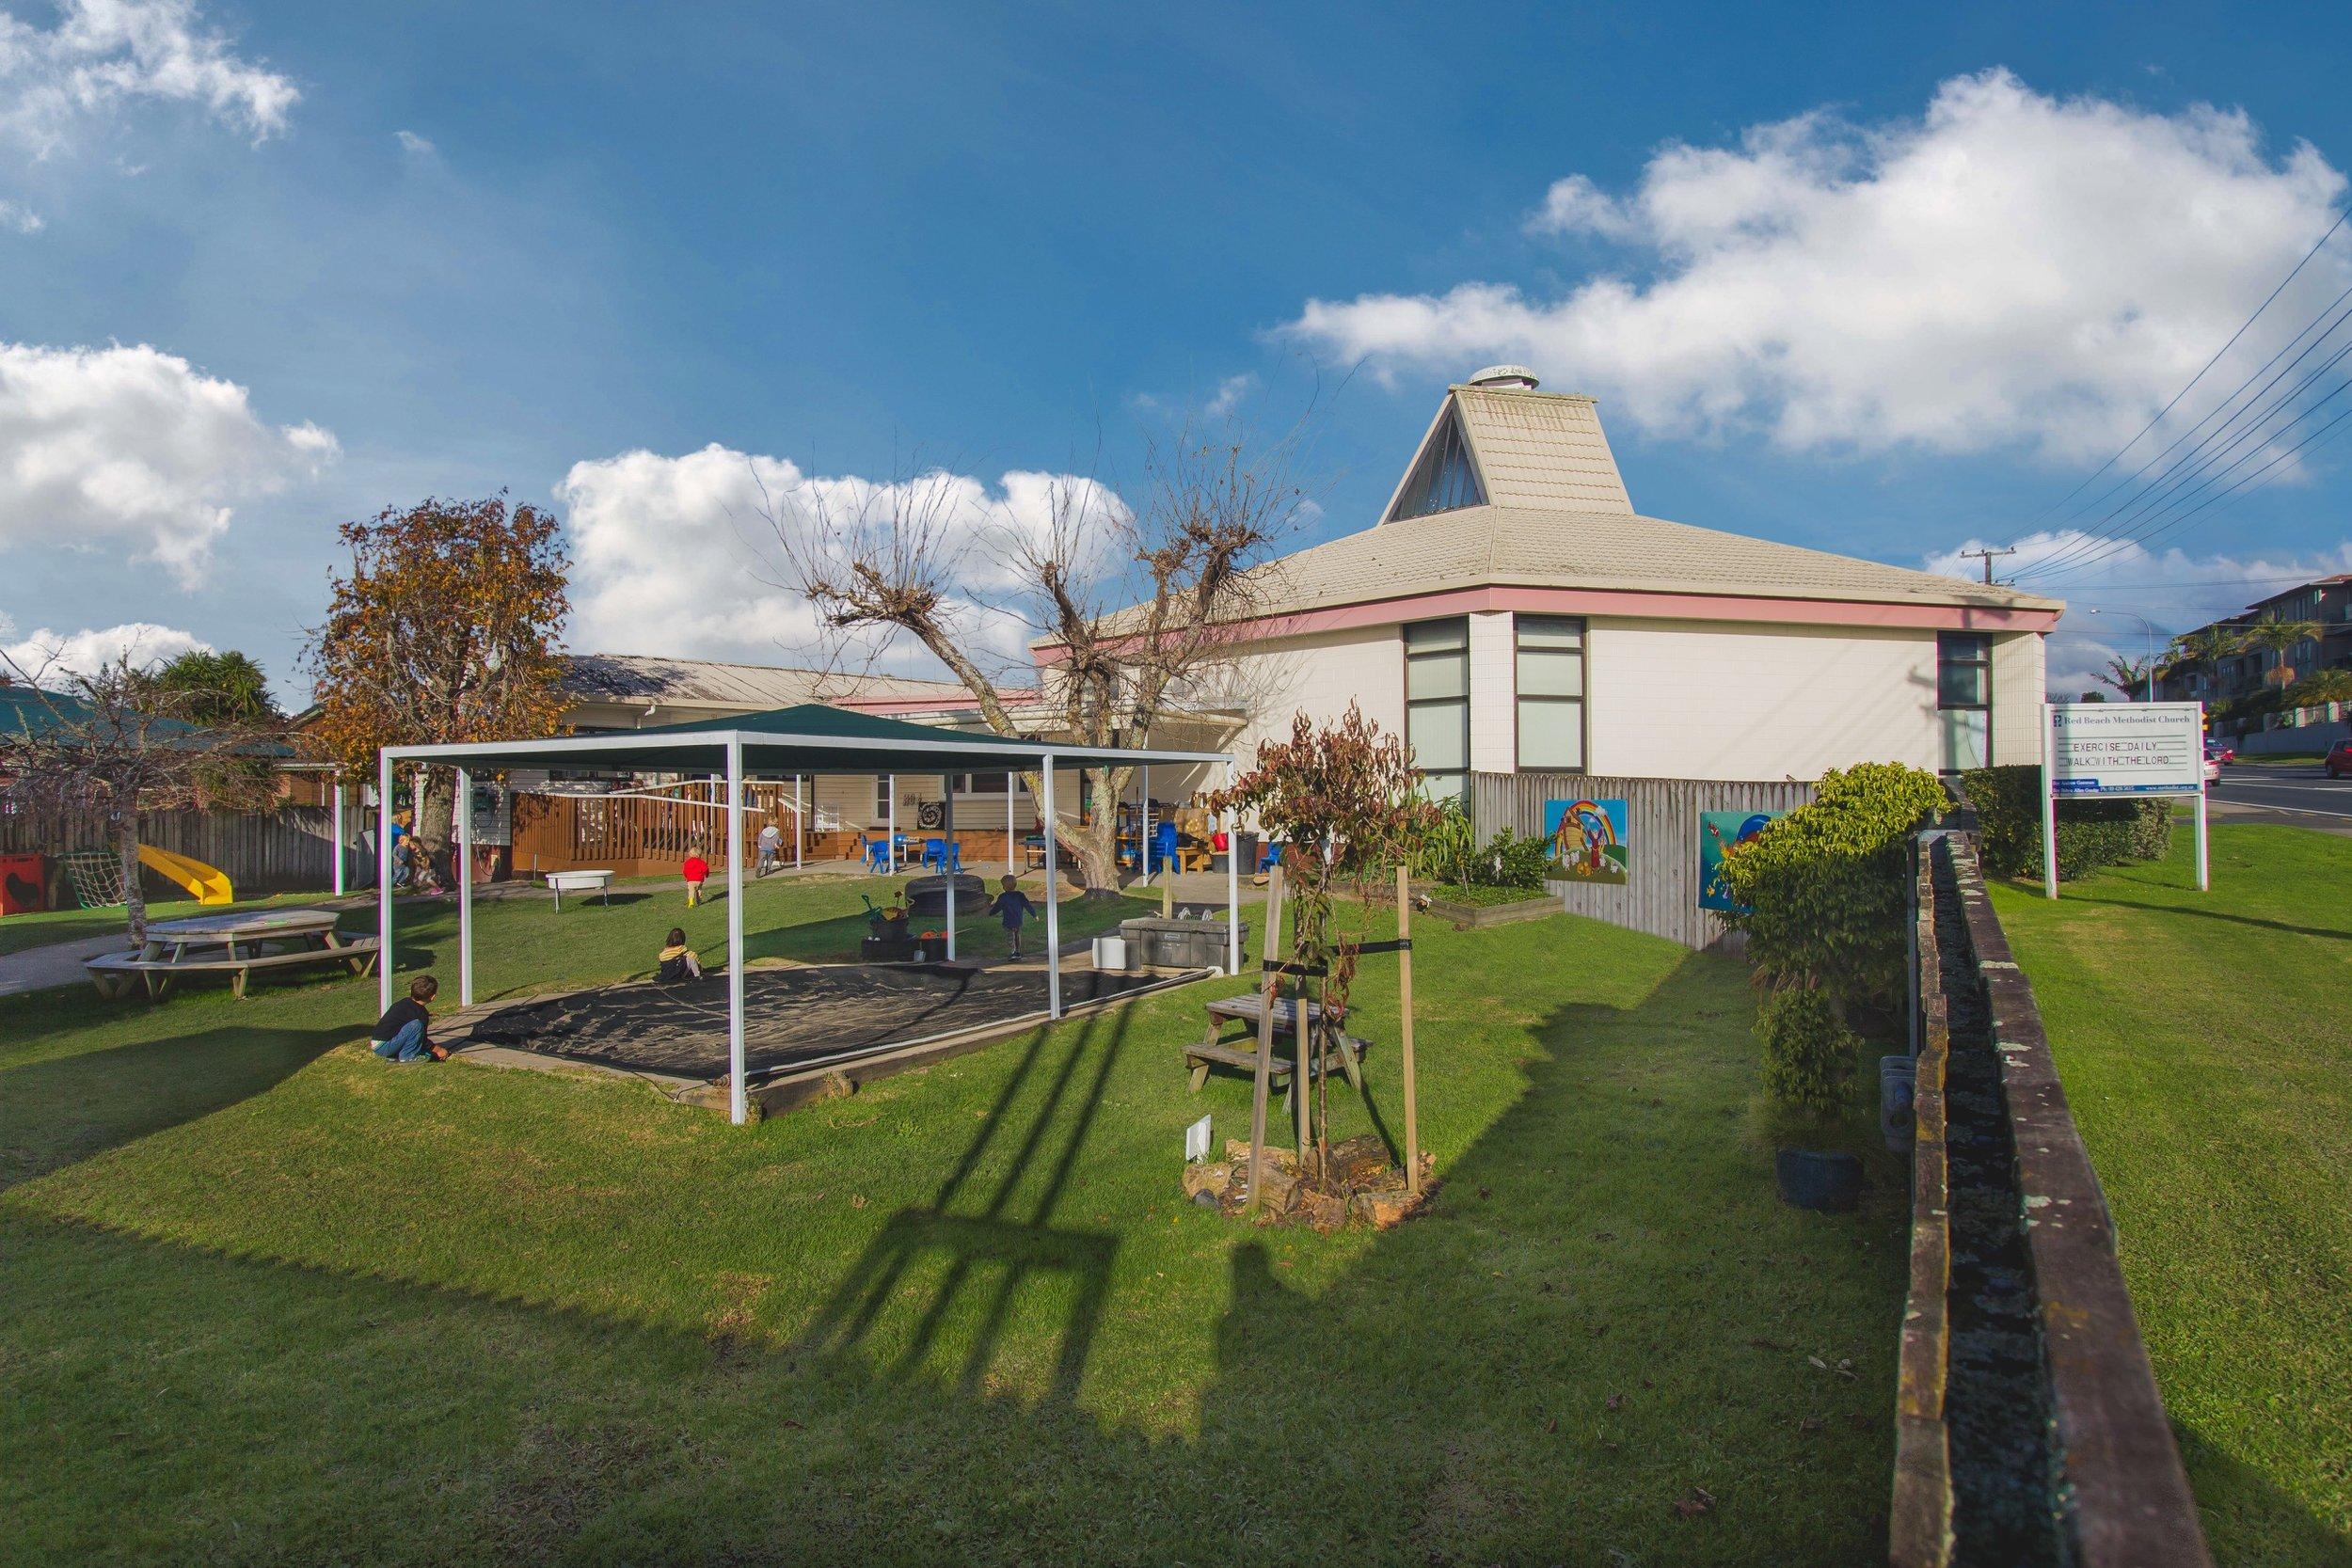 KingsWay-Preschools-New-Zealand-Red-Beach-1174-Web.jpg